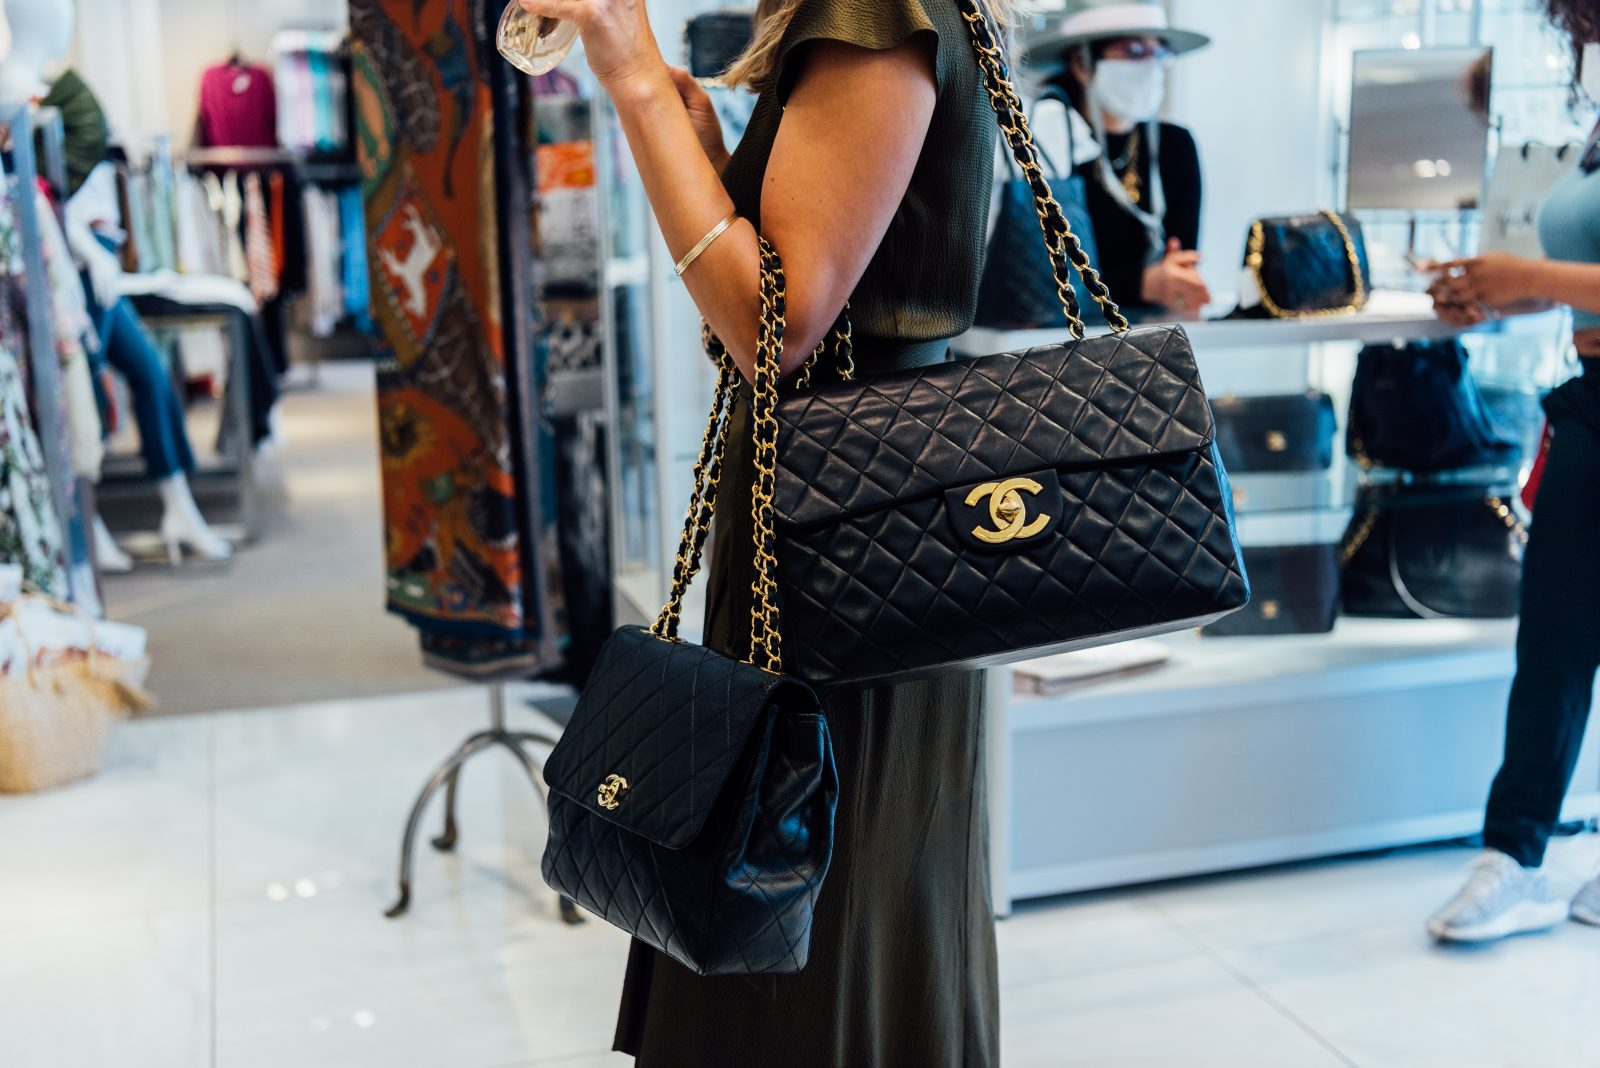 Chanel showcase bags at Gus Mayer